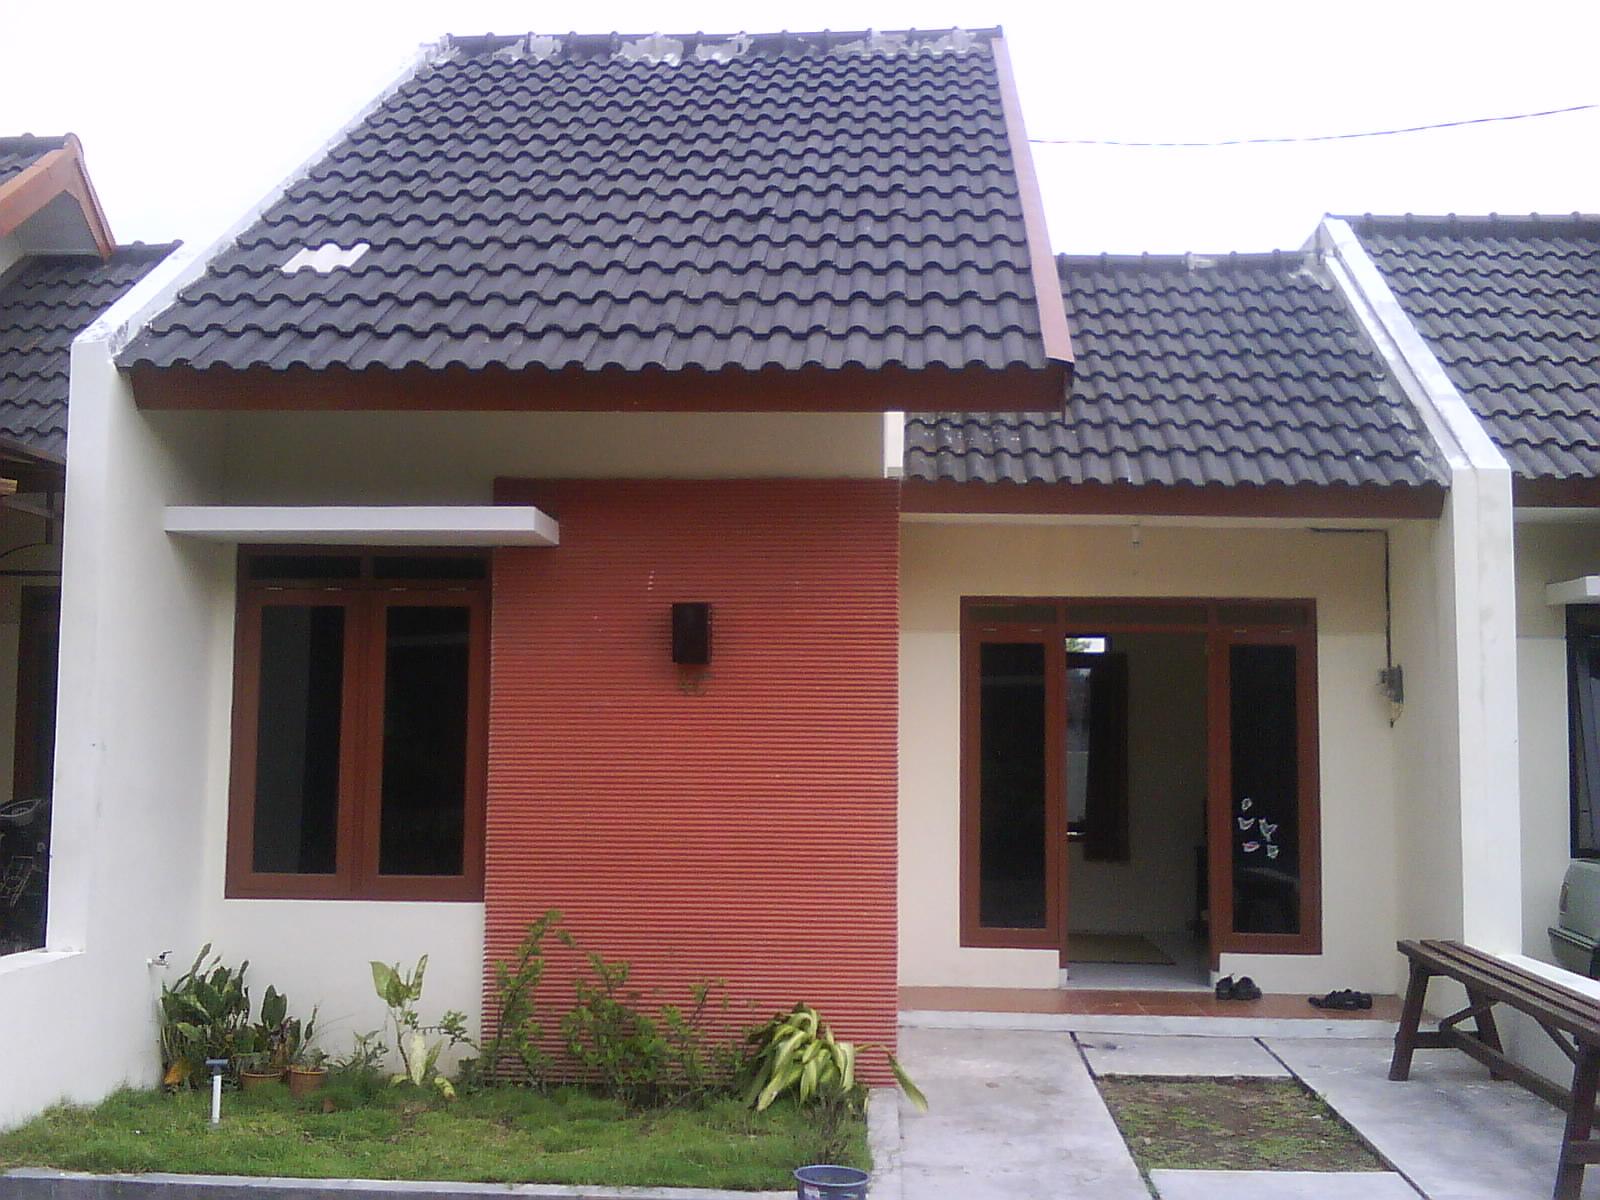 610 Gambar Rumah Minimalis Sederhana Ukuran 8x12 Terbaru